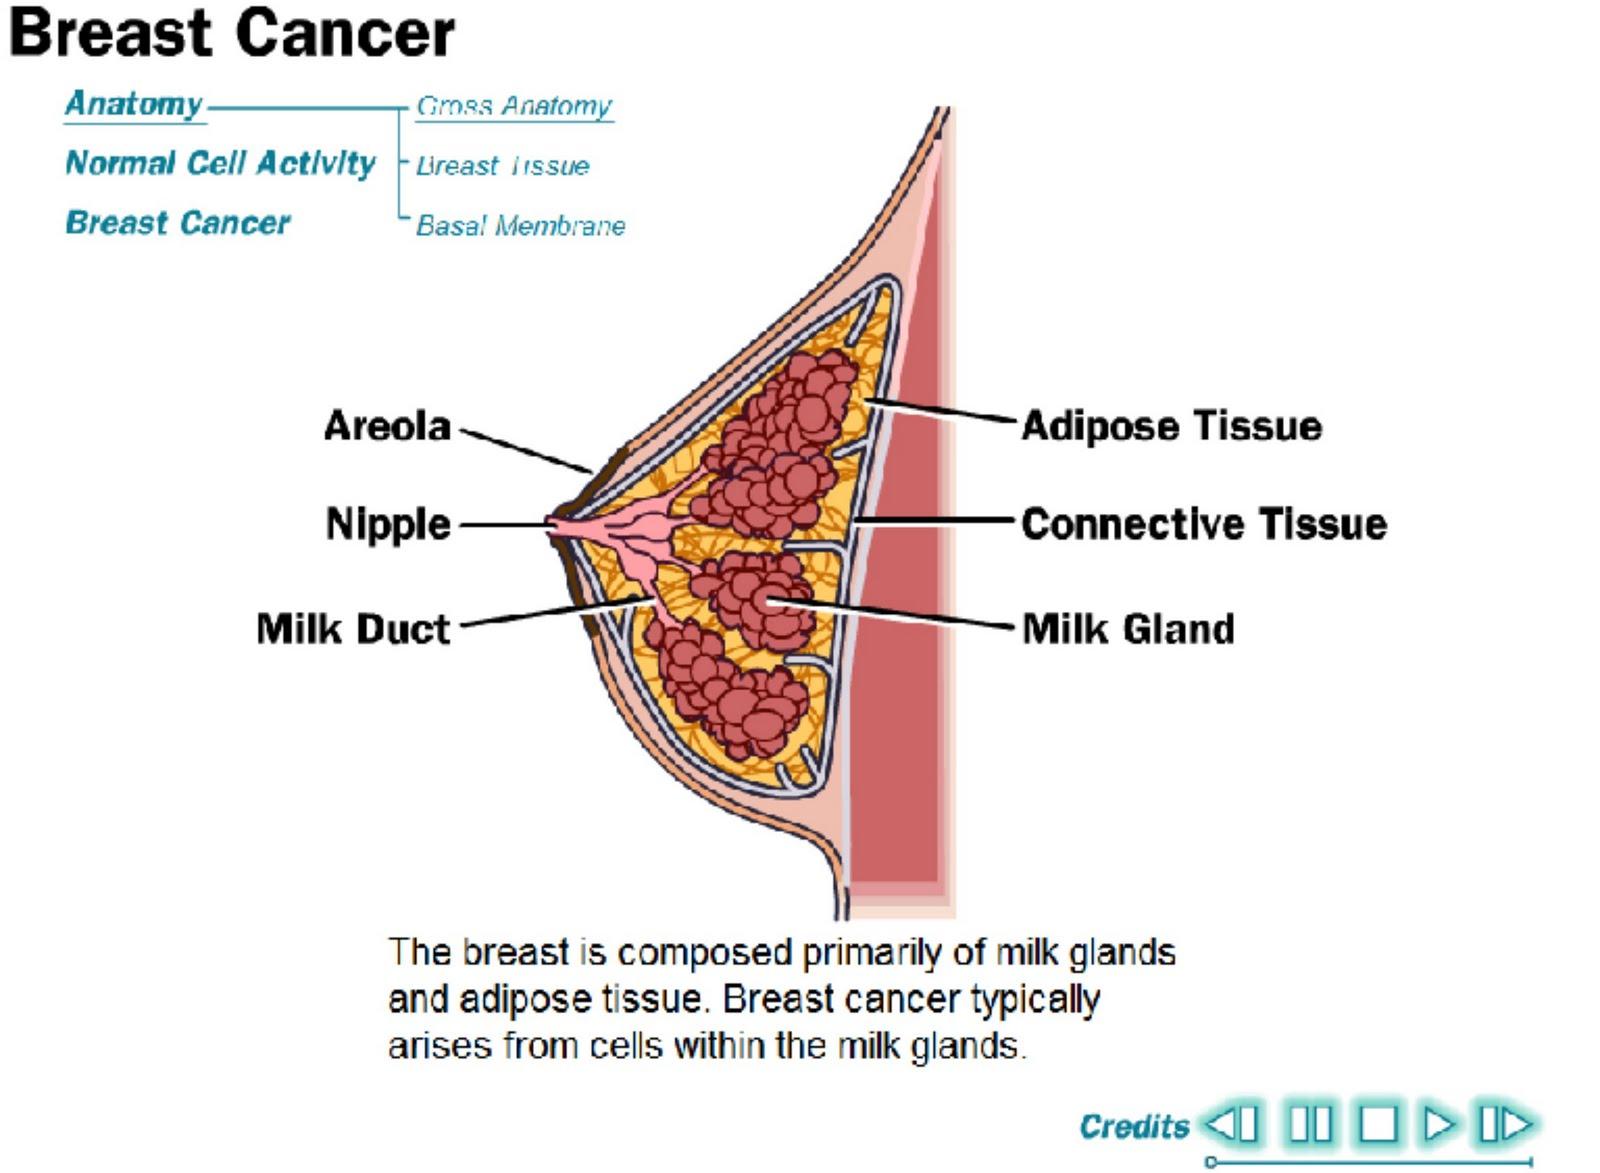 http://1.bp.blogspot.com/-PqllcLVbywg/TifDTj1UEhI/AAAAAAAAAGI/wcUv2t2rCzE/s1600/breastcancer.jpg